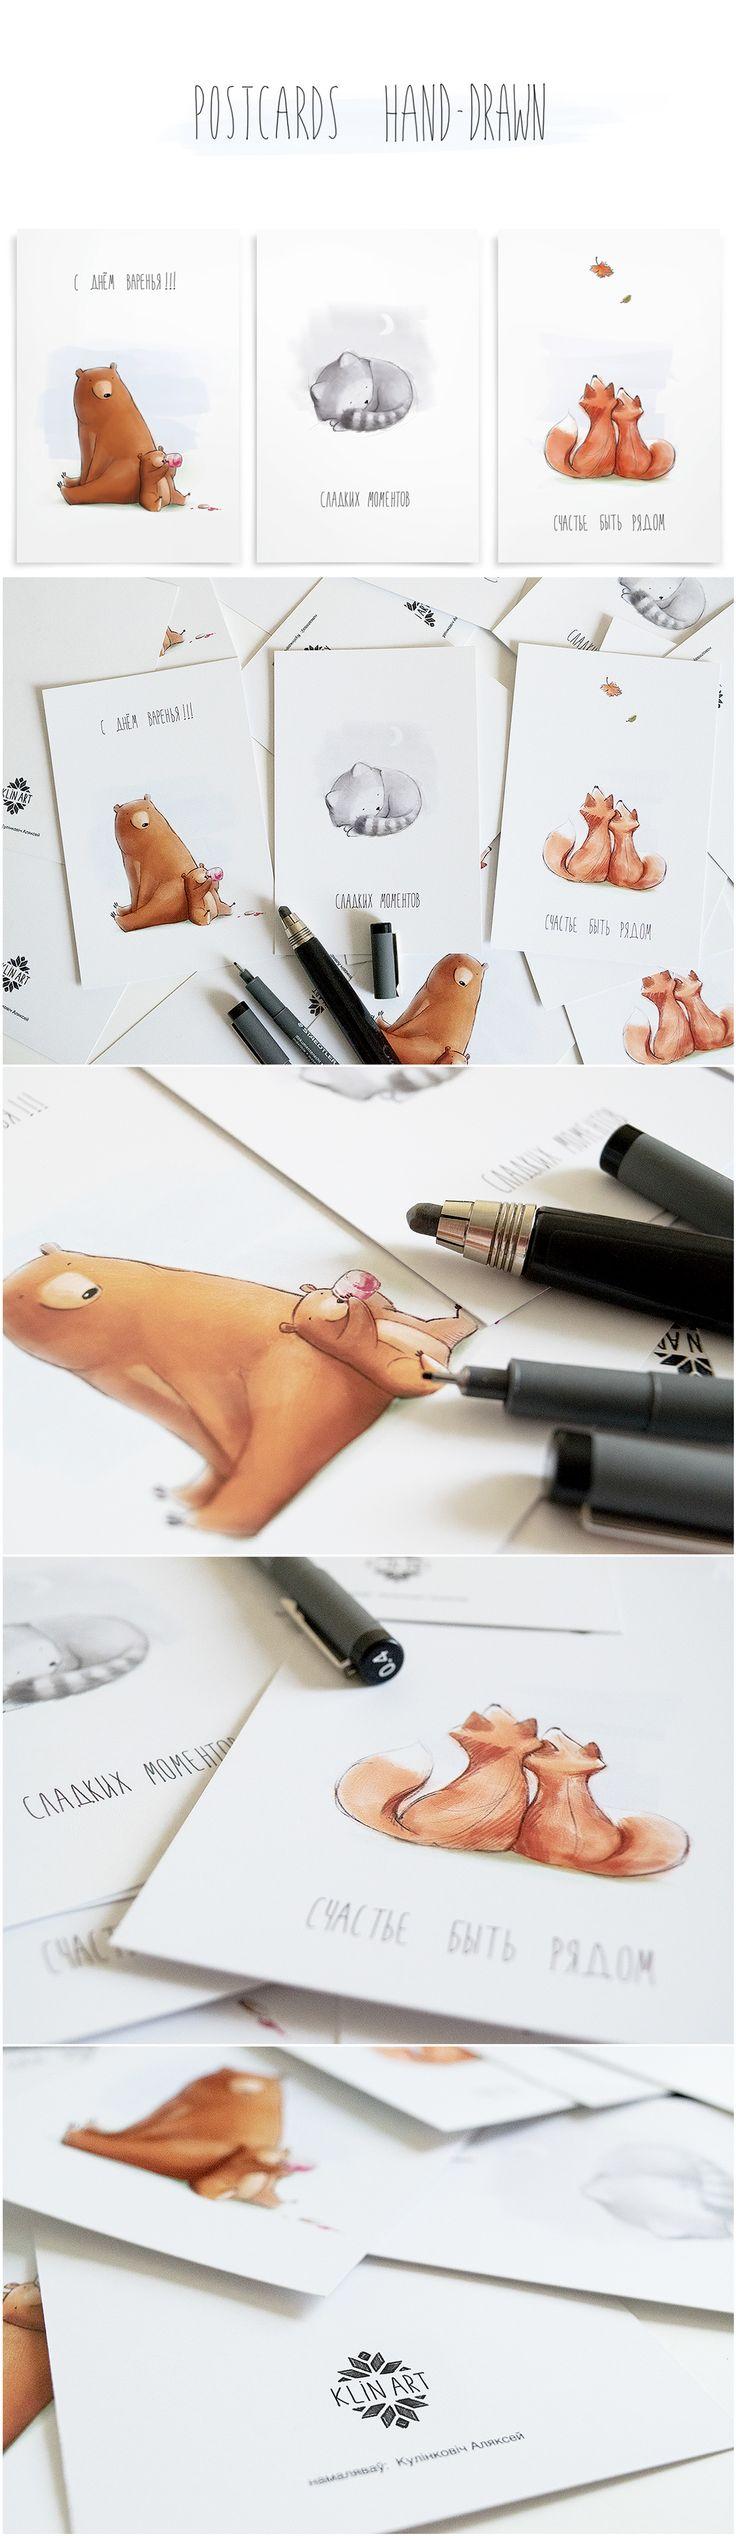 awwww cute handmade postcard idea. love the drawing so much